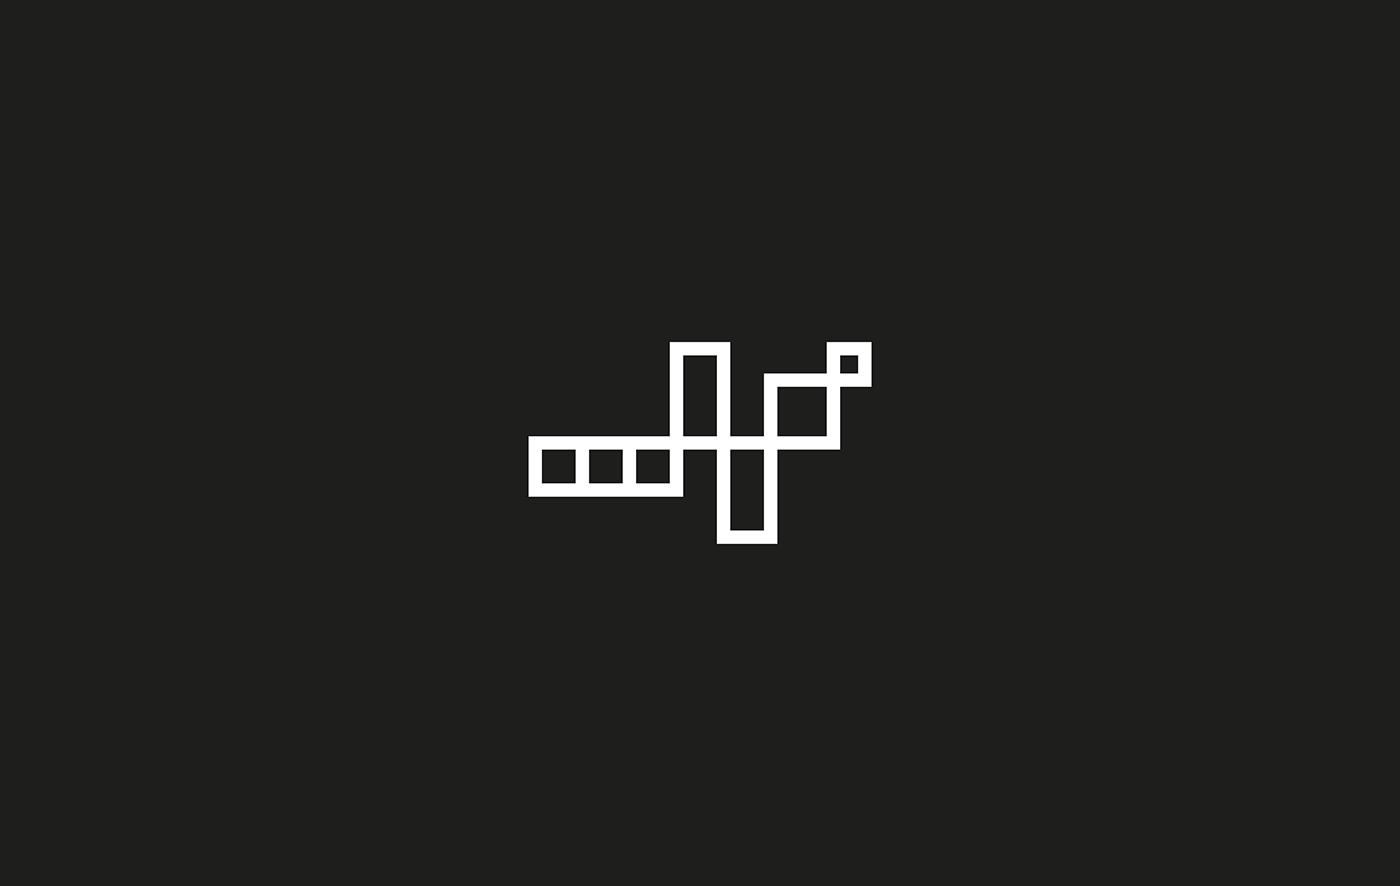 identity logo black Kufi Kuwait KSA amman arabic pattern design